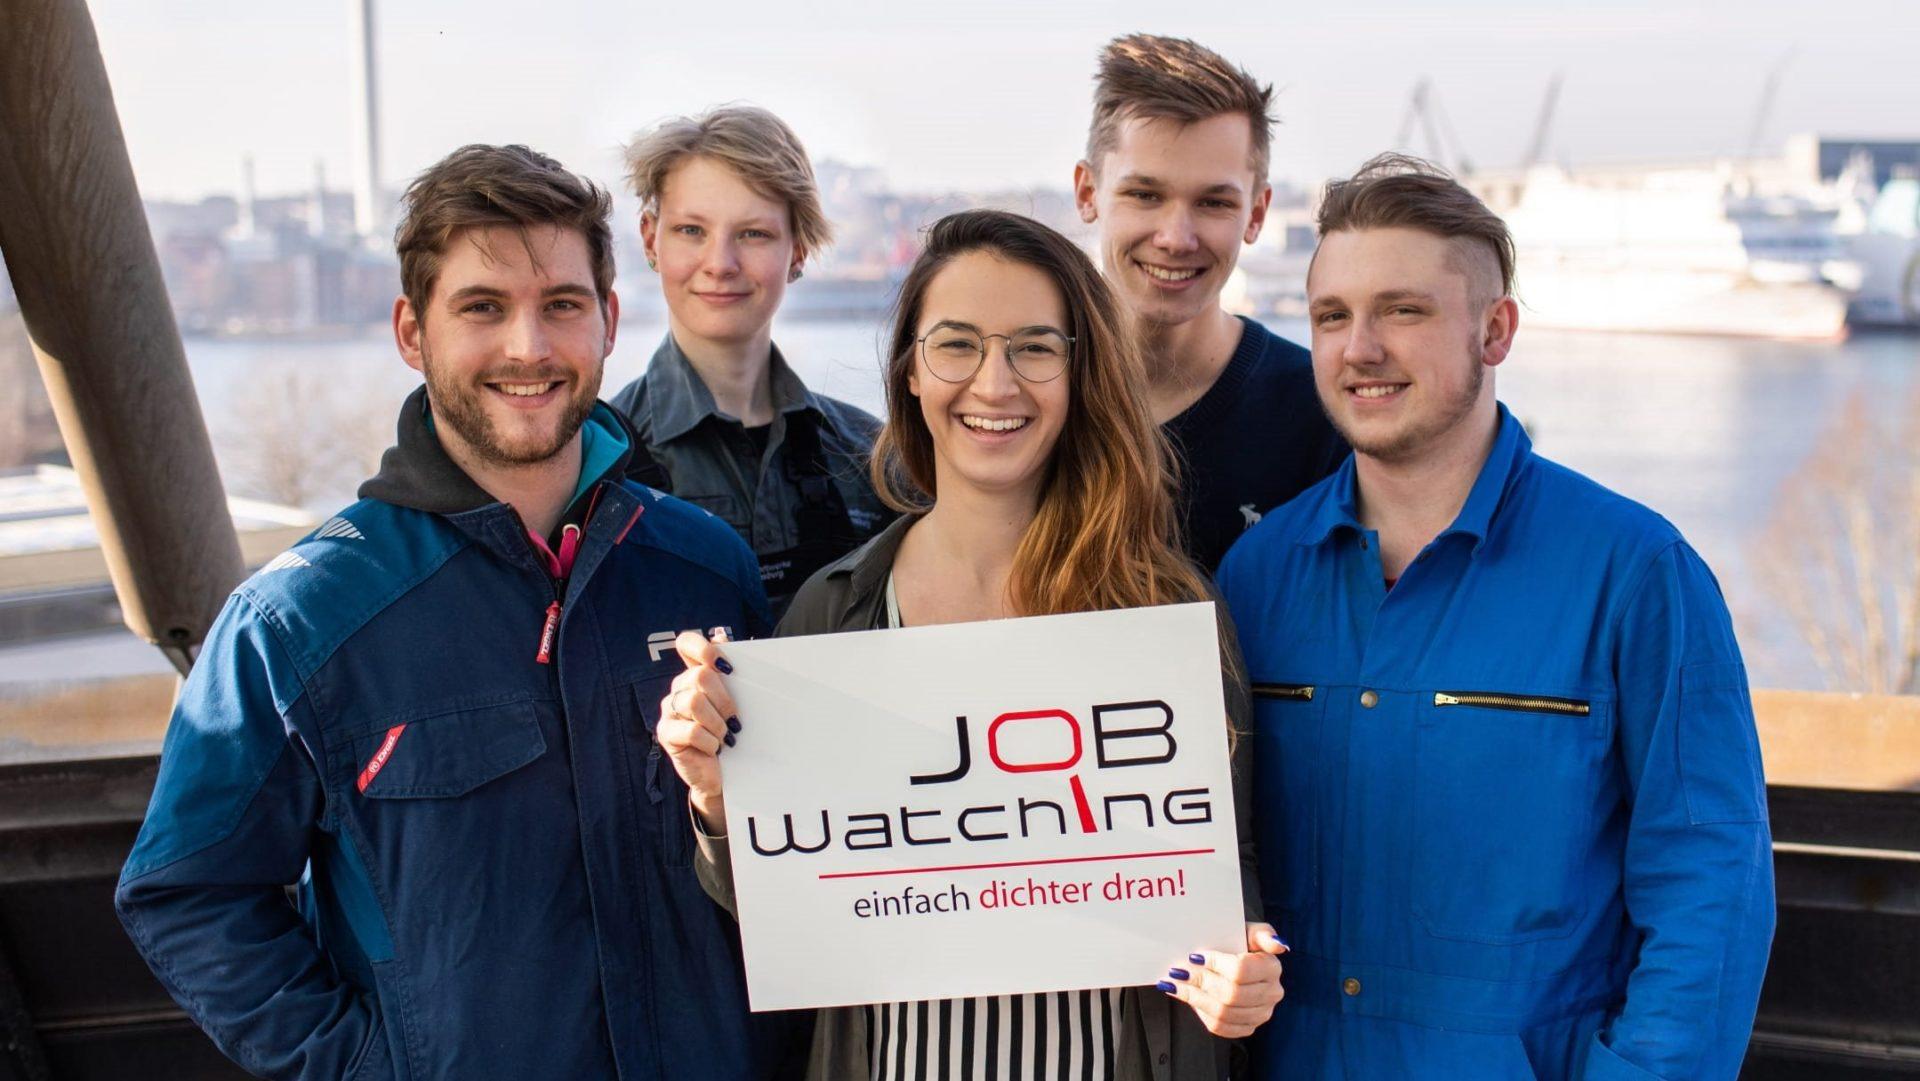 Jobwatching